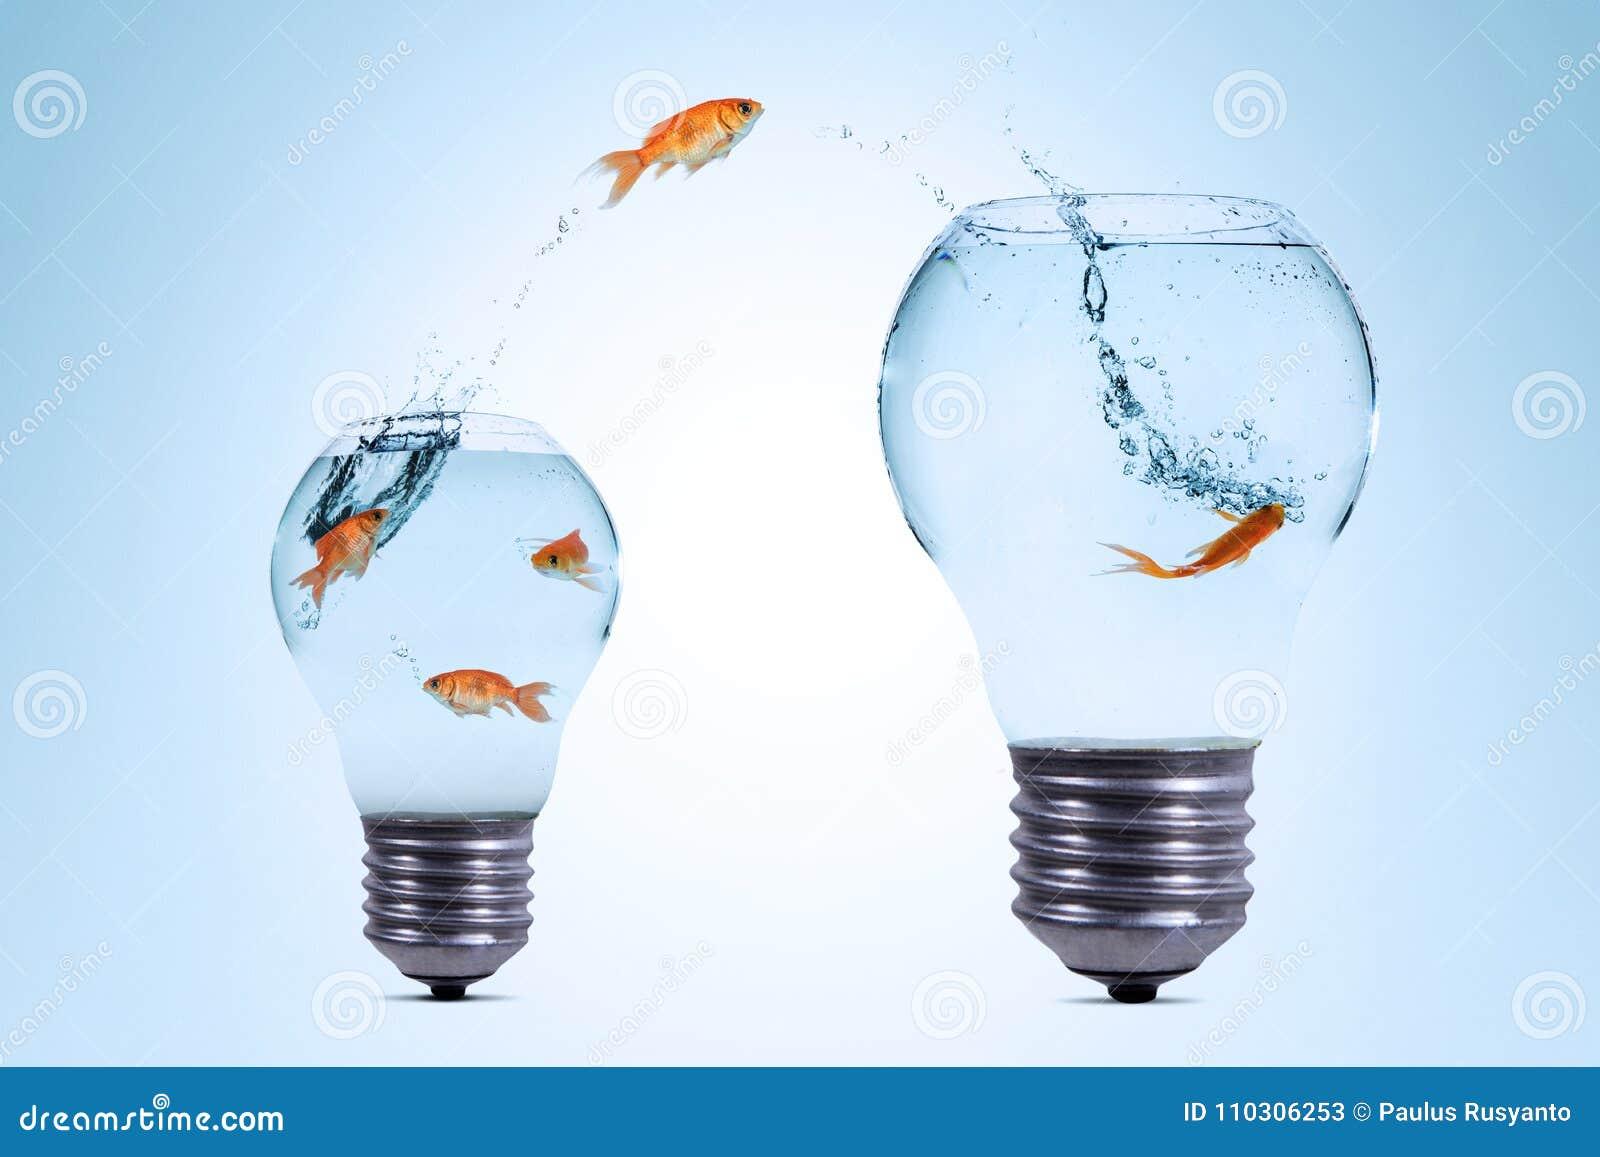 Gold fish jumping out from a smaller aquarium to bigger aquarium